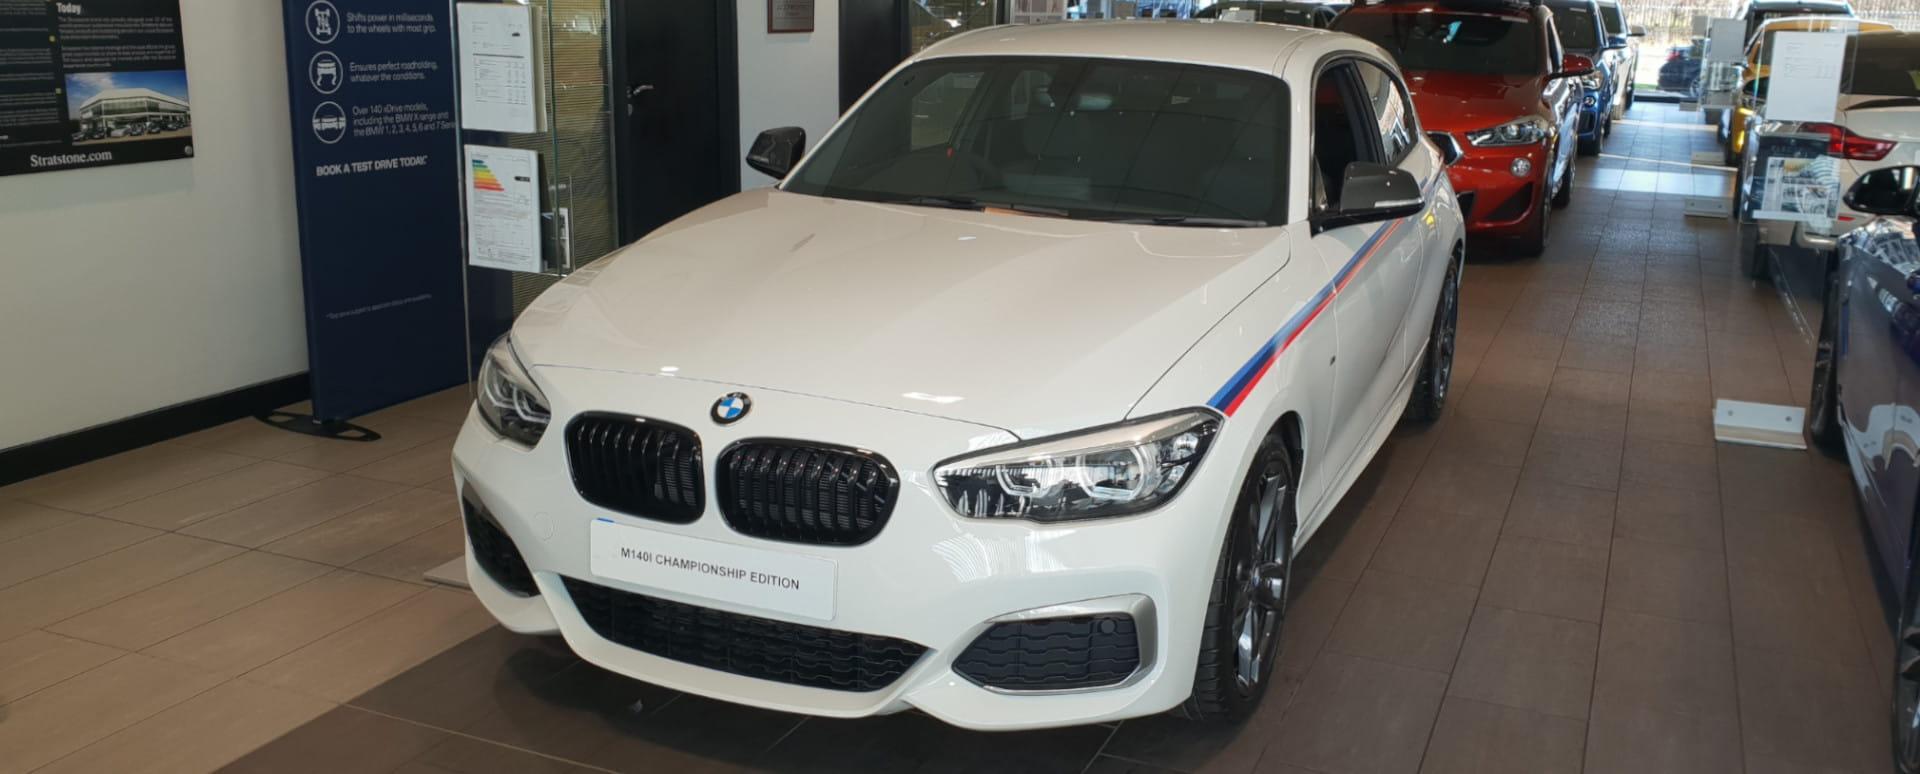 BMW M140i Championship Edition Large